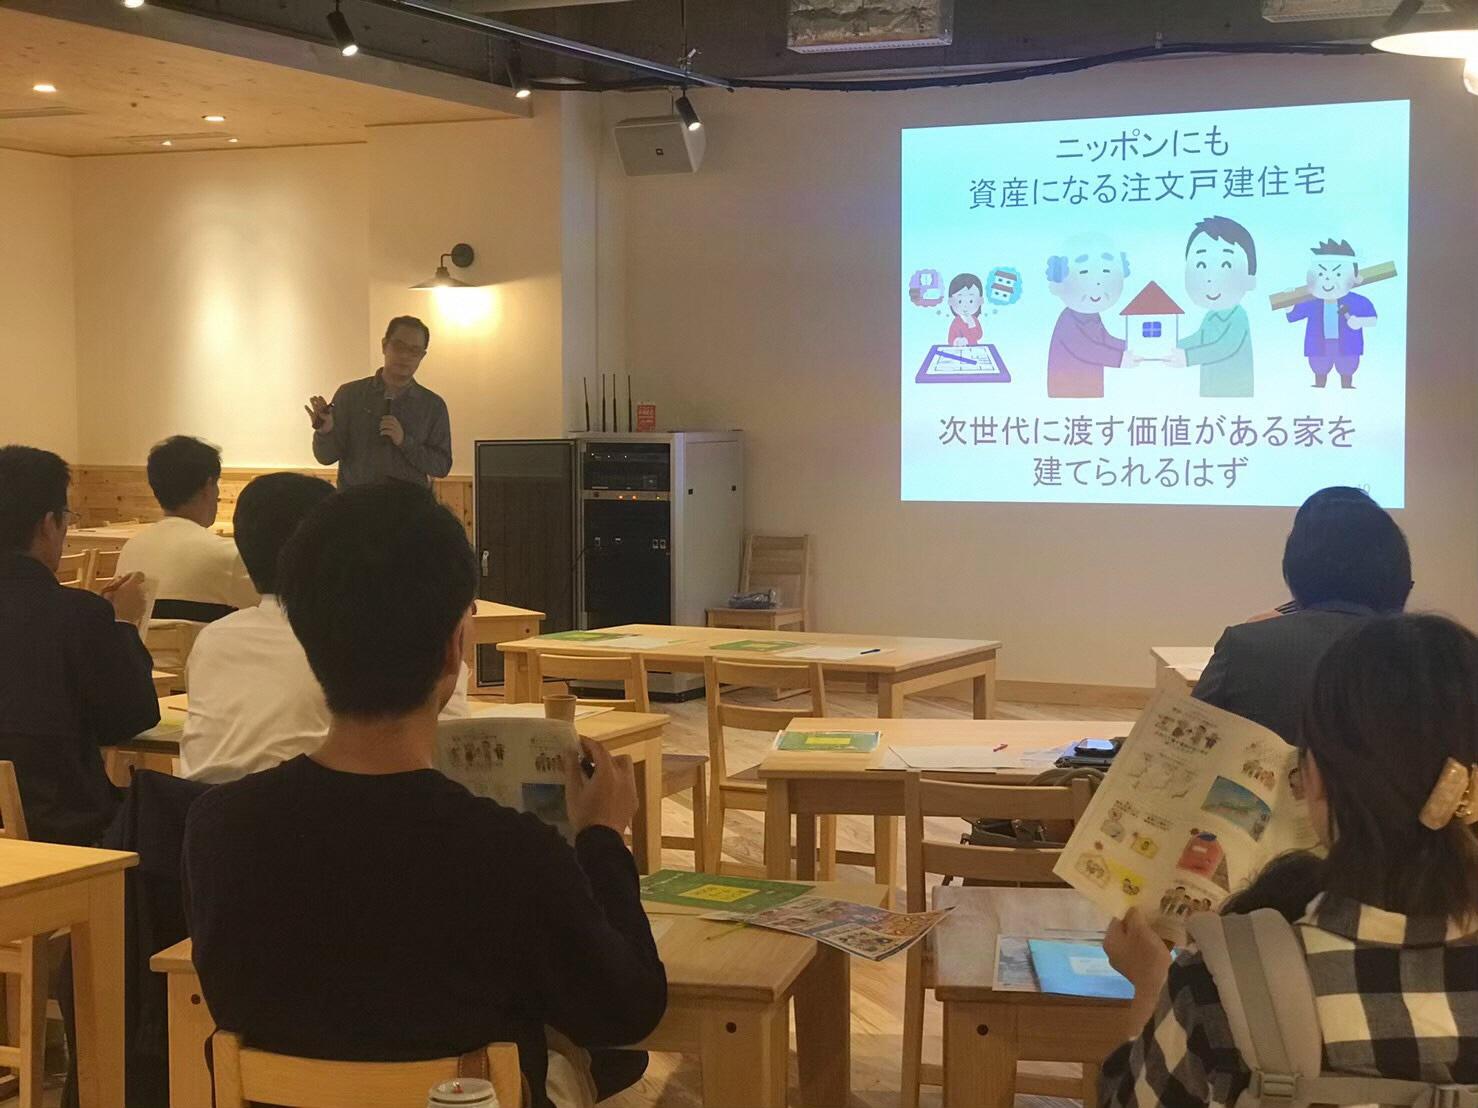 http://www.shizutan.jp/ondanka/event/2020/01/07/images/IMG-3965.JPG